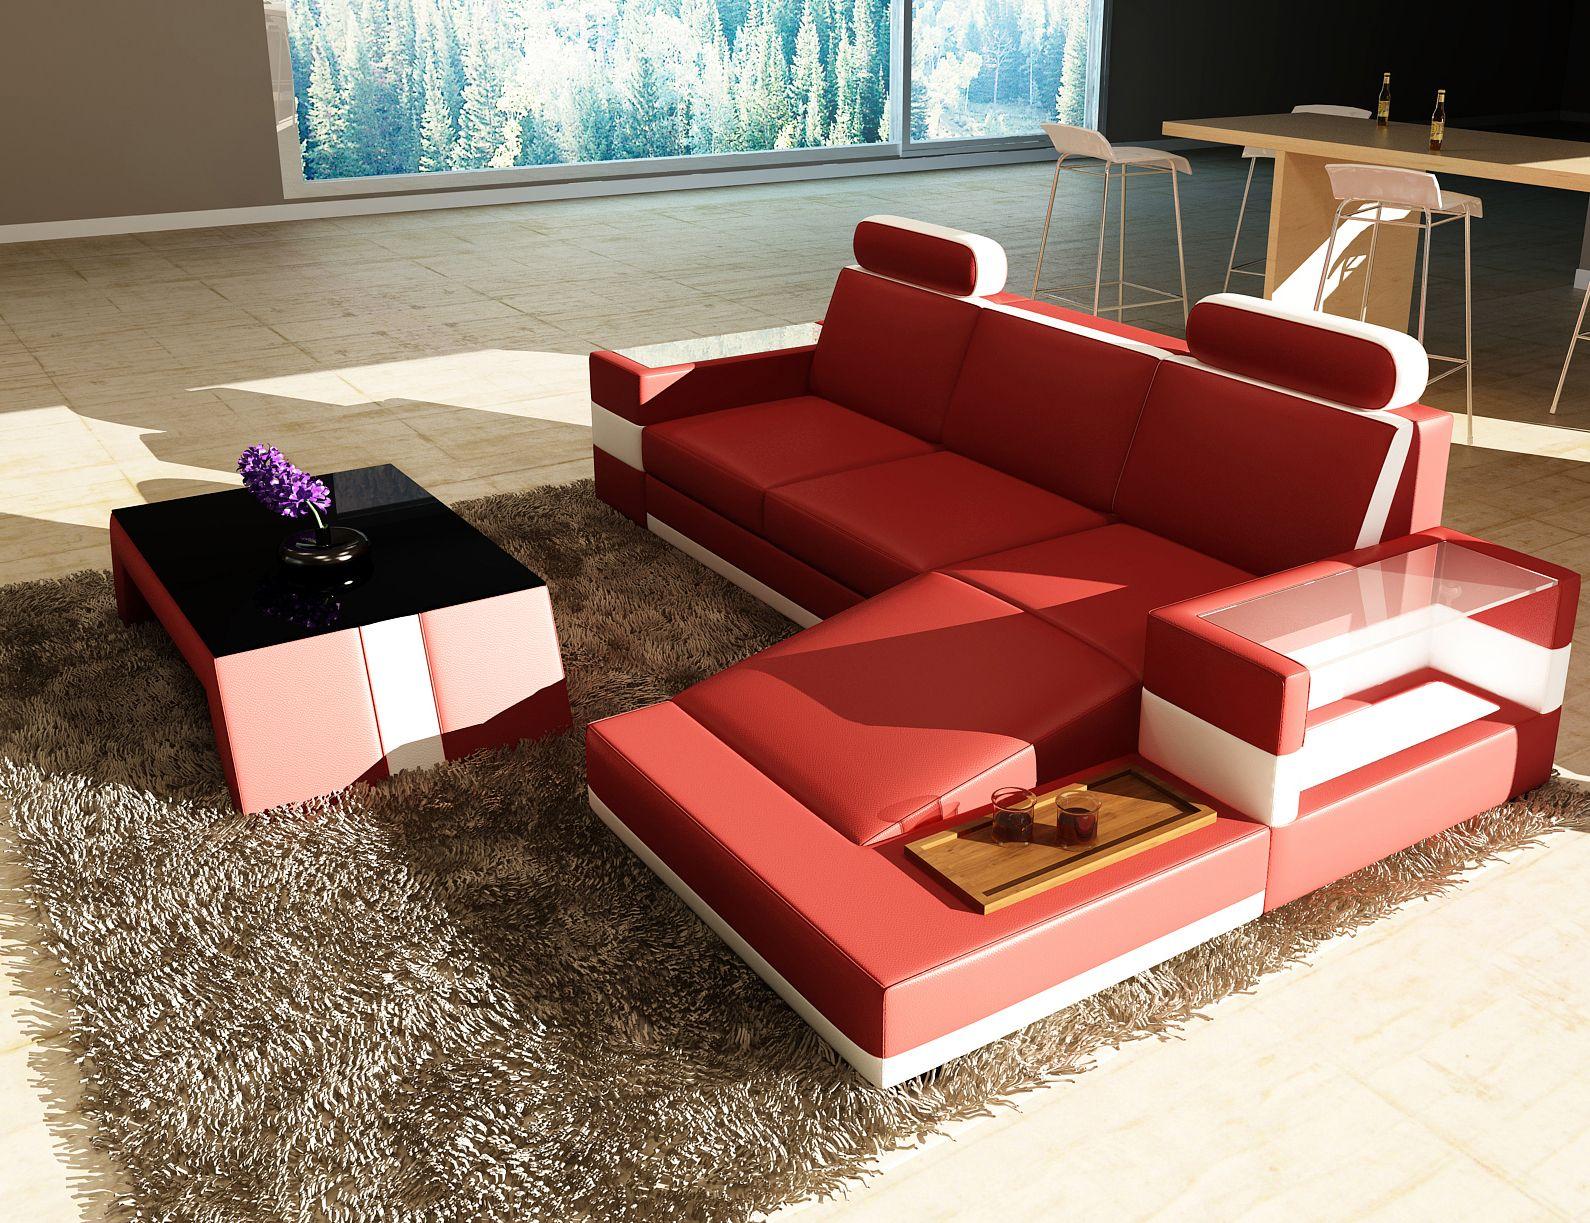 Schnittsofa schnittsofa modell 5100bdie m bel aus italien - Mobel aus italien ...